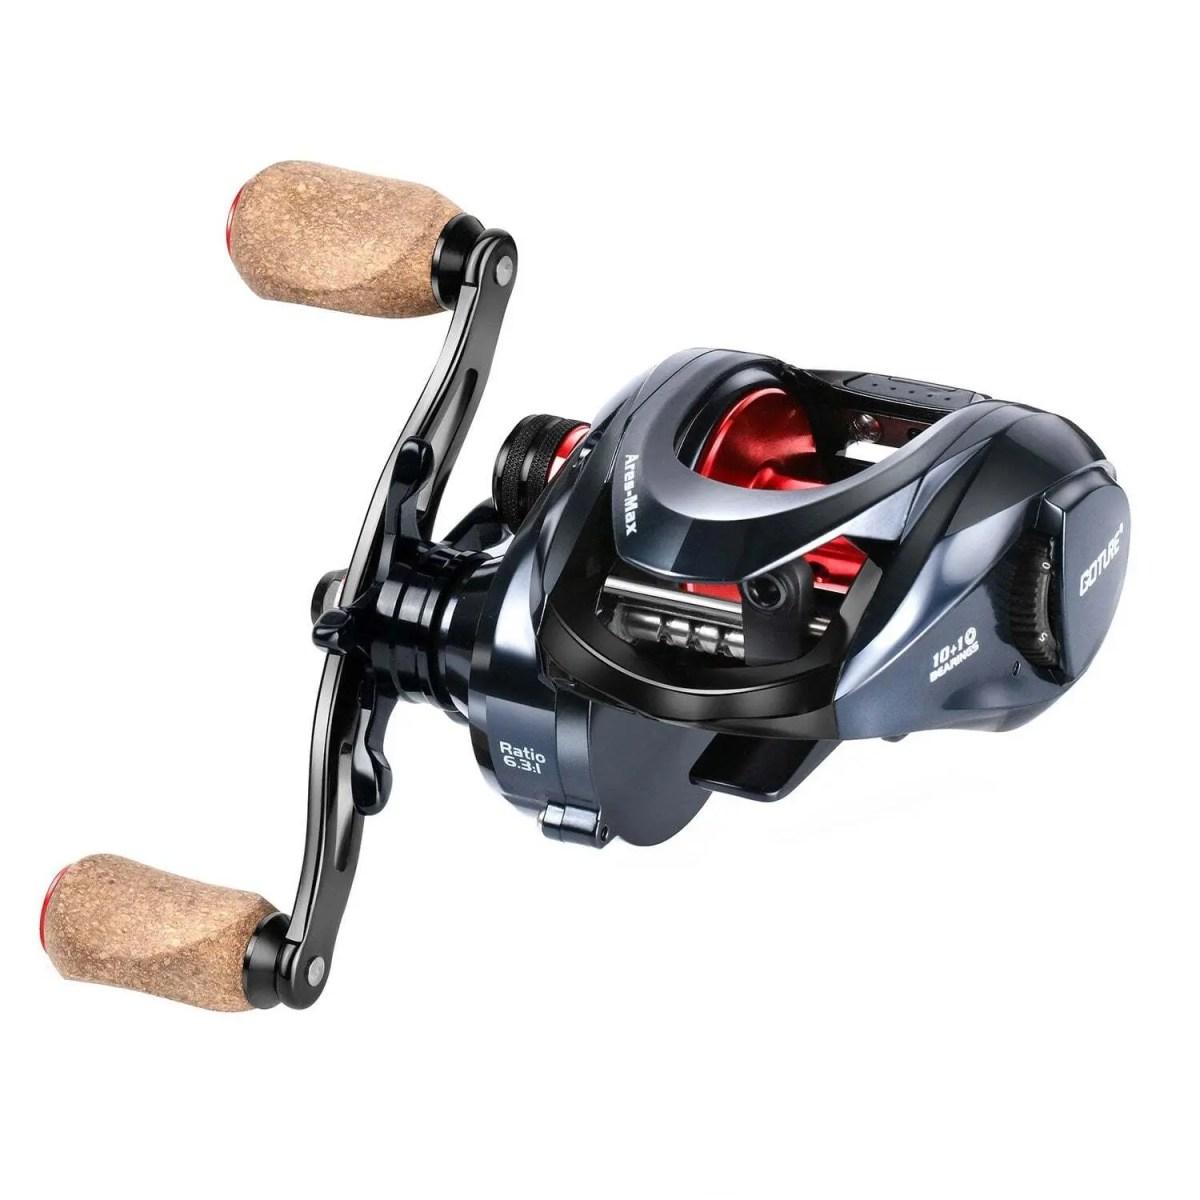 Goture Ares-Max Baitcasting Fishing Reel